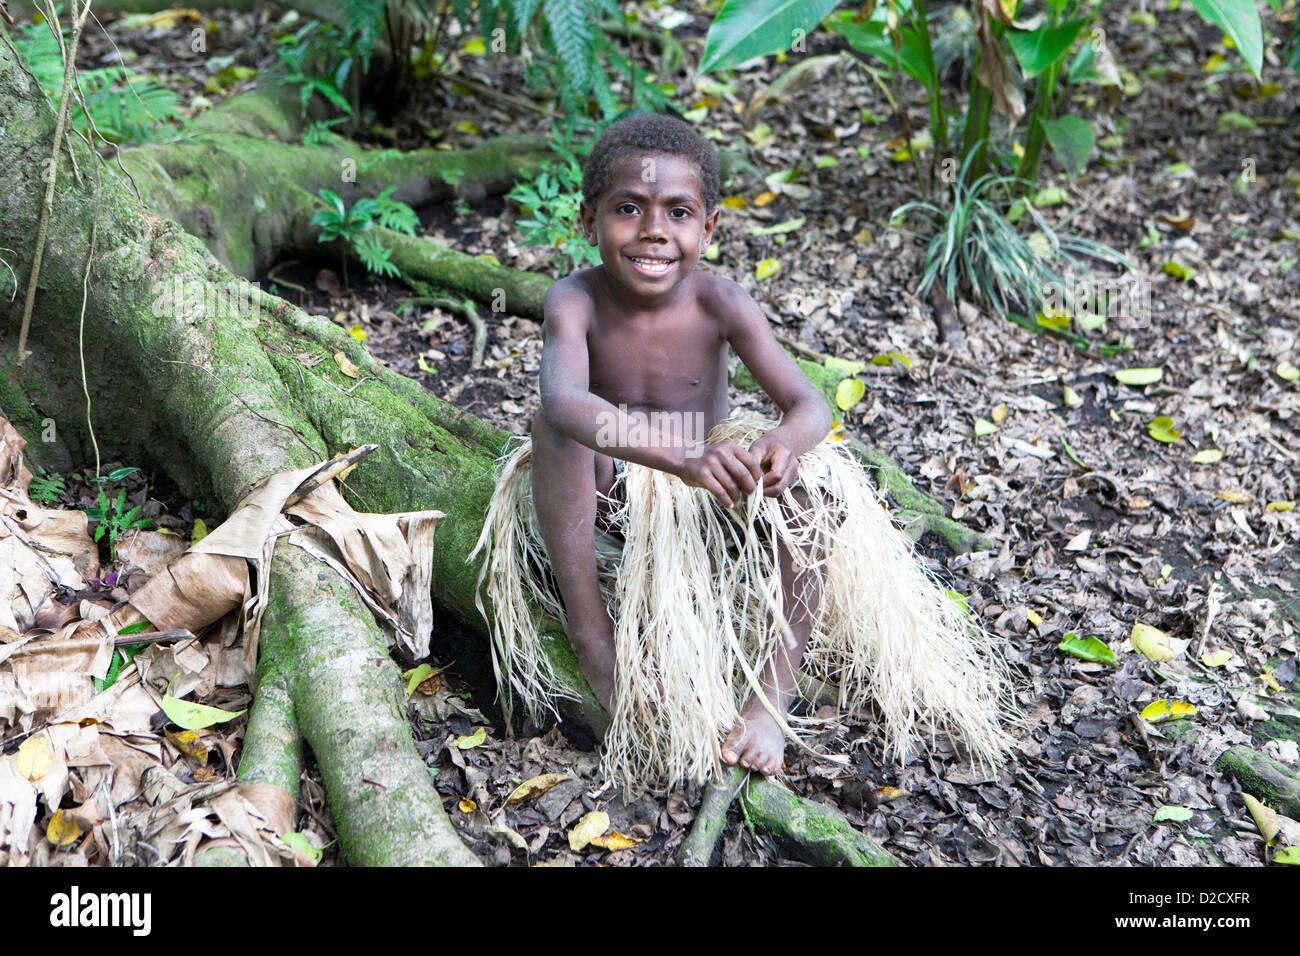 Micronesian Boy, Tanna Island, Vanuaty, South Pacific - Stock Image